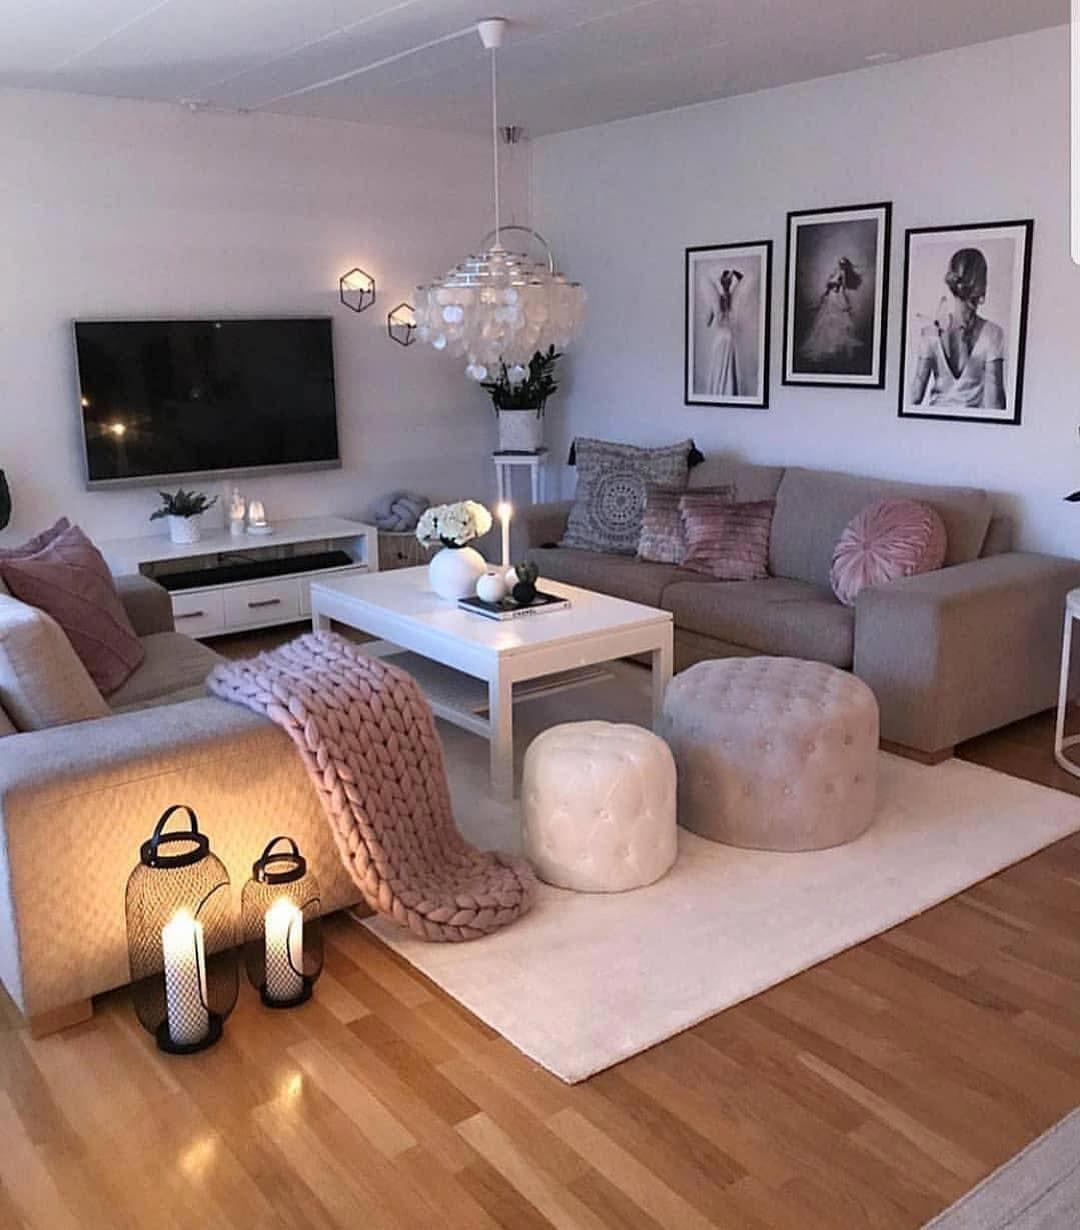 40 Most Beautiful Living Room Ideas 2021 Hairstylesofwomens Com Apartment Living Room Design Living Room Decor Gray Grey Sofa Living Room